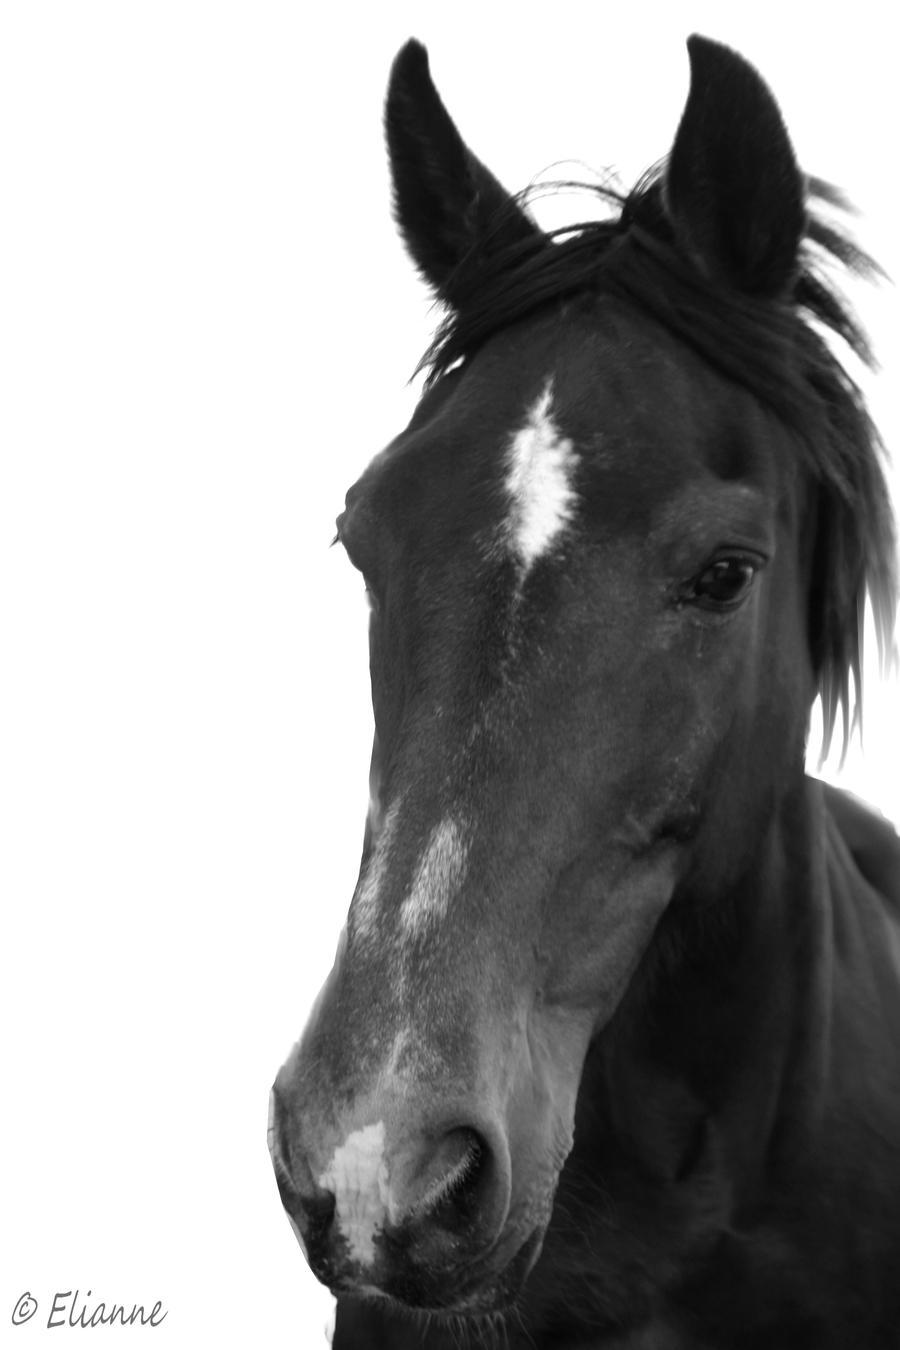 horse black and white by eliannne on deviantart. Black Bedroom Furniture Sets. Home Design Ideas